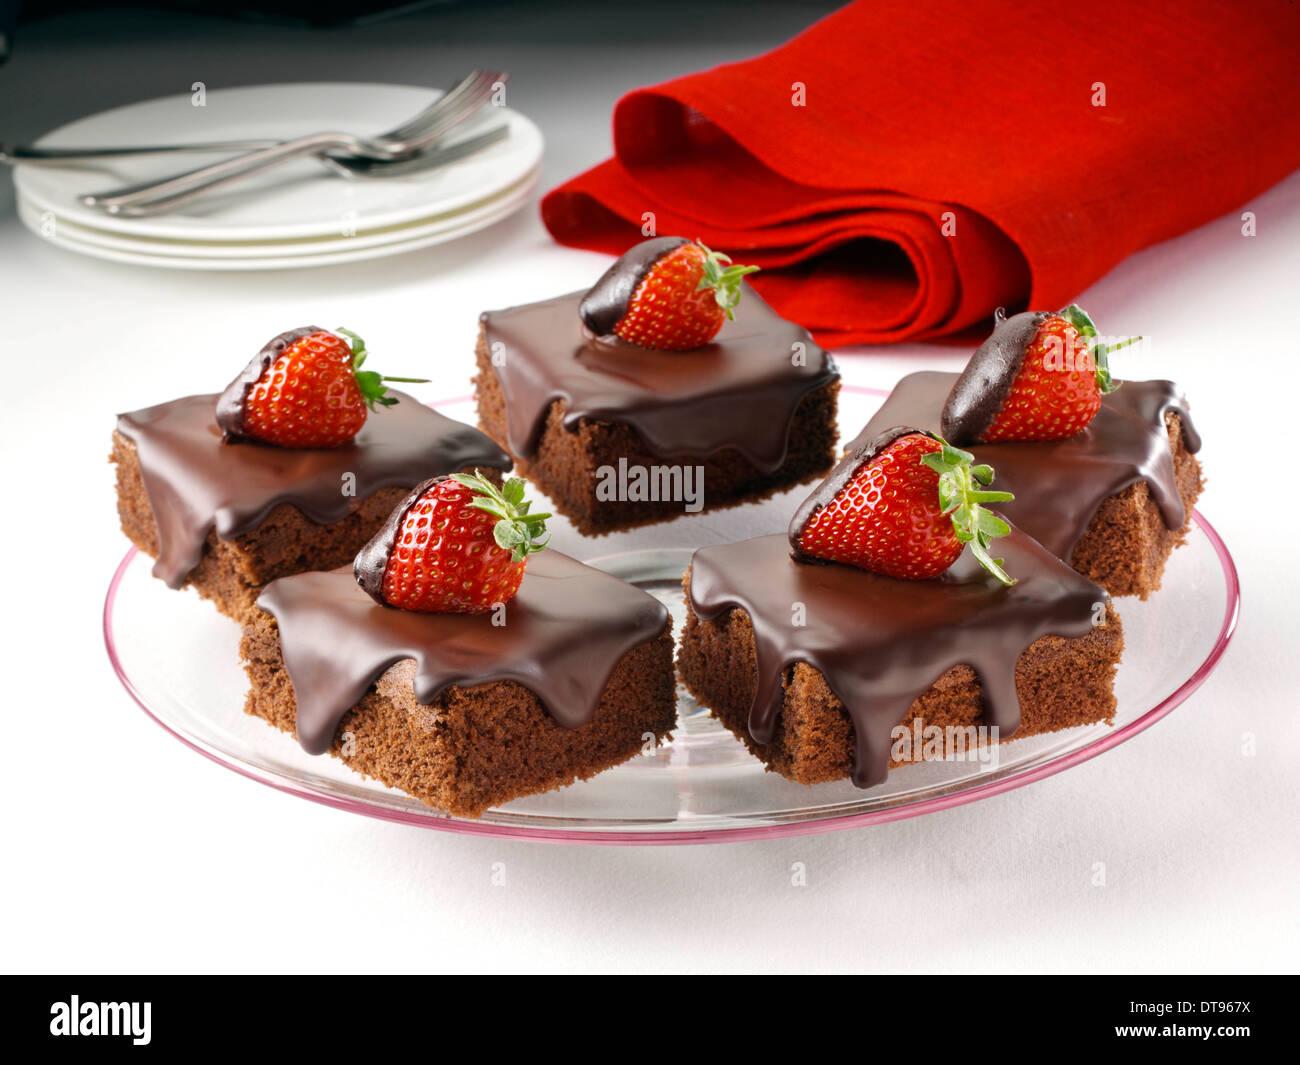 Cupid Chocolate Cake Home Made Traybake Valentine S Day Romantic